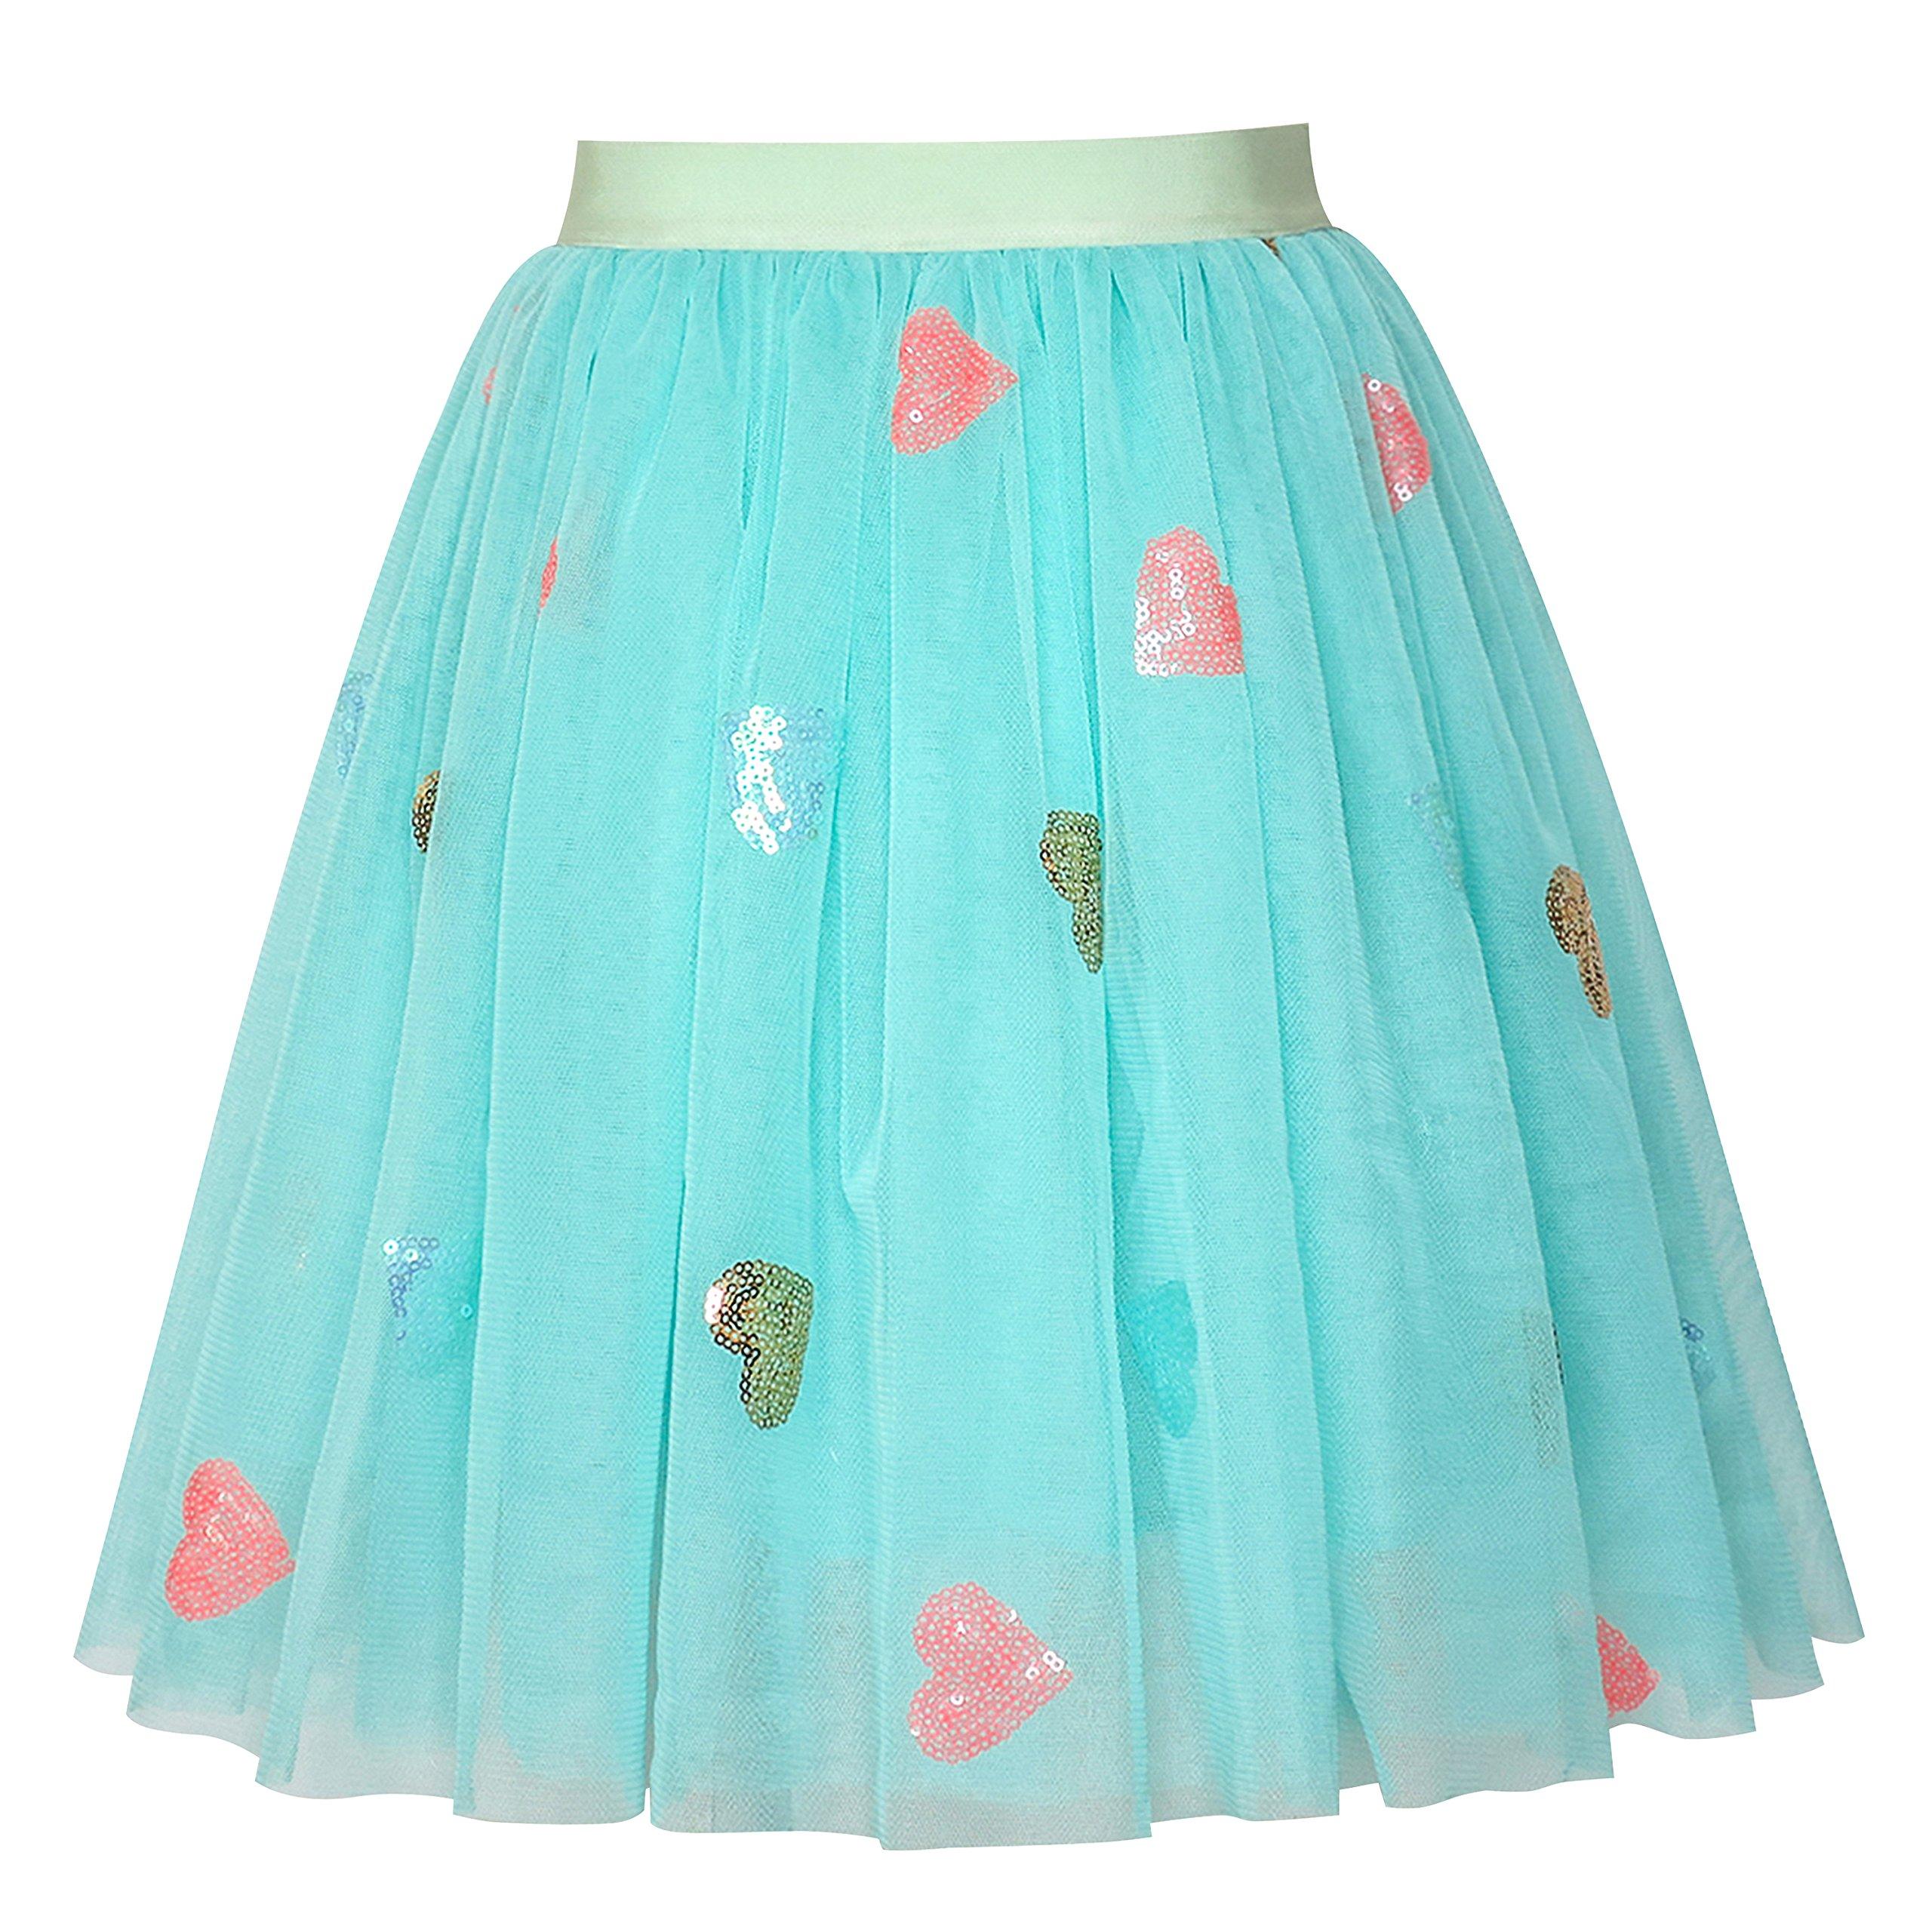 Girls Skirt Blue Heart Sequins Sparkling Tutu Dancing Age 2-12 Years